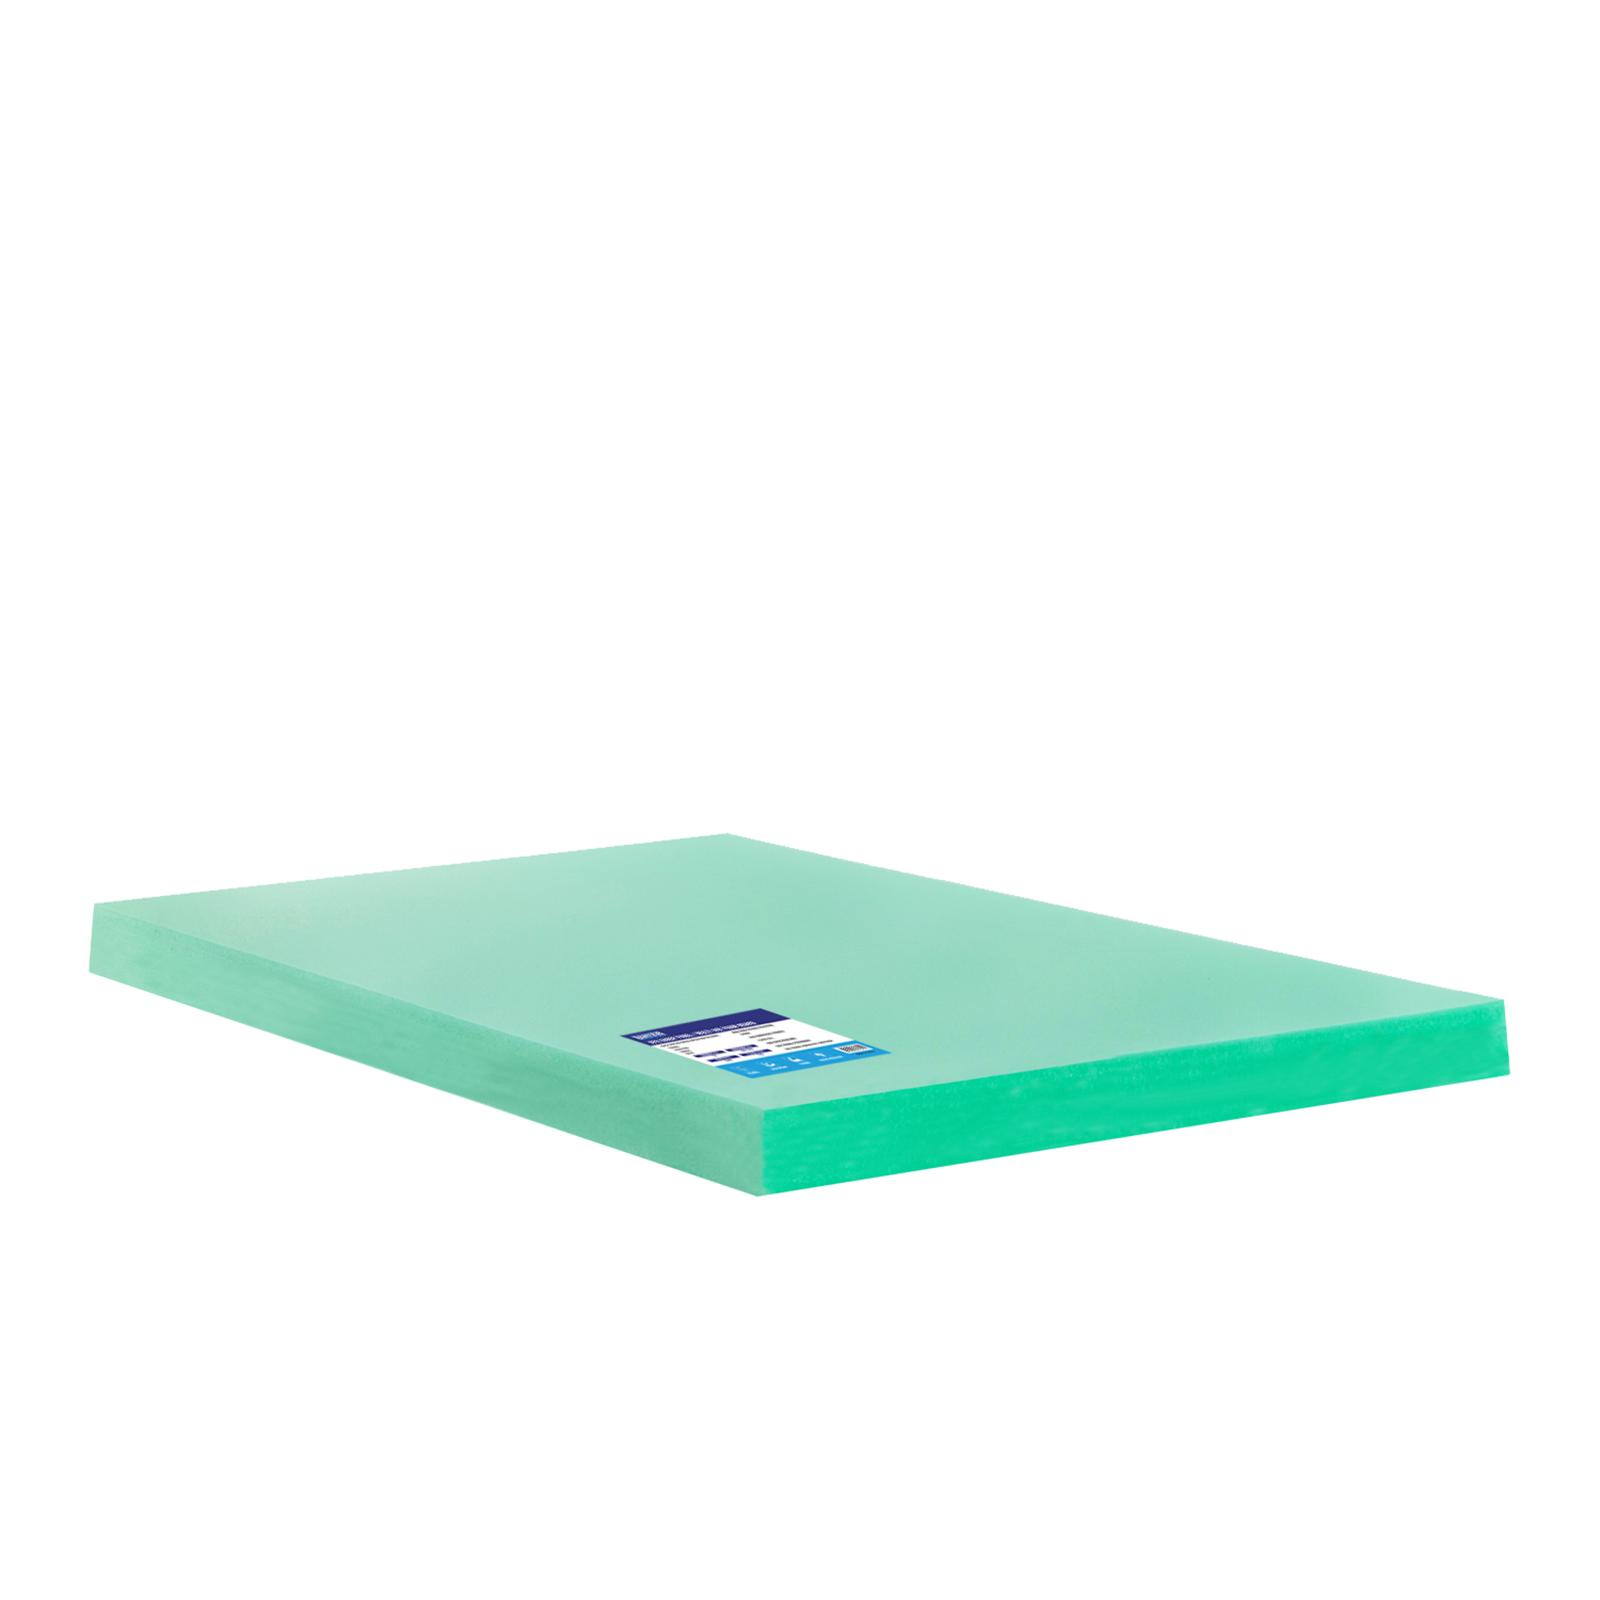 Bastion 1200 x 600 x 50mm XPS Multi-Use Insulation Foam Board